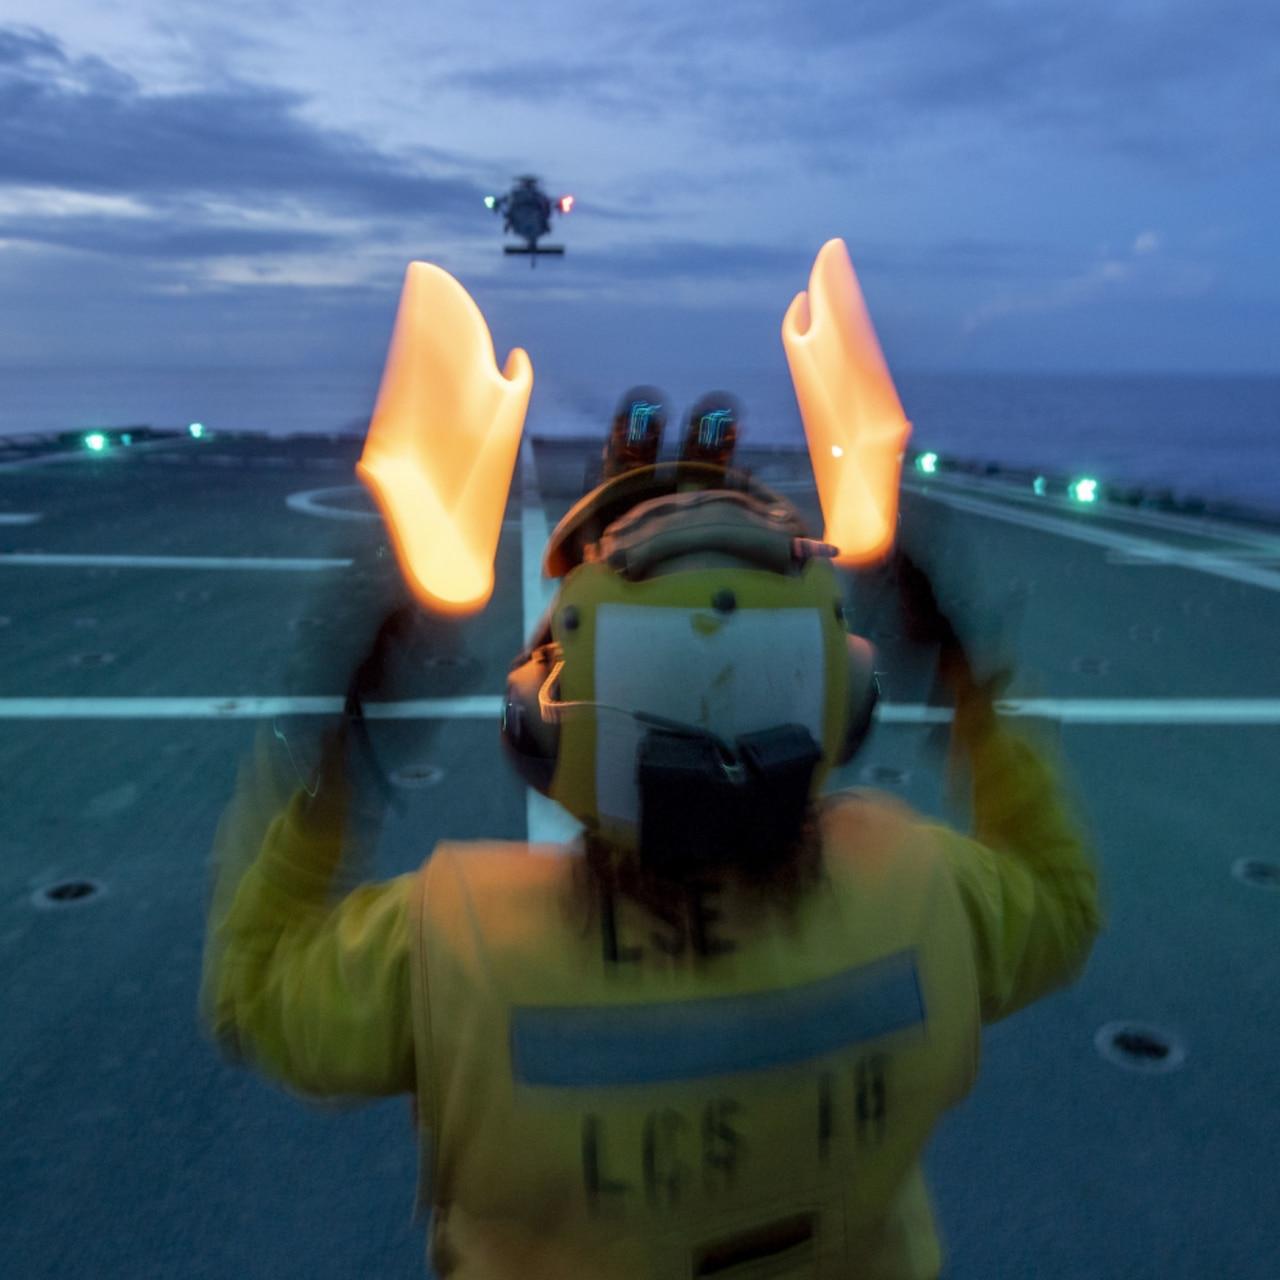 Flight Operations On Board USS Charleston (LCS 18)